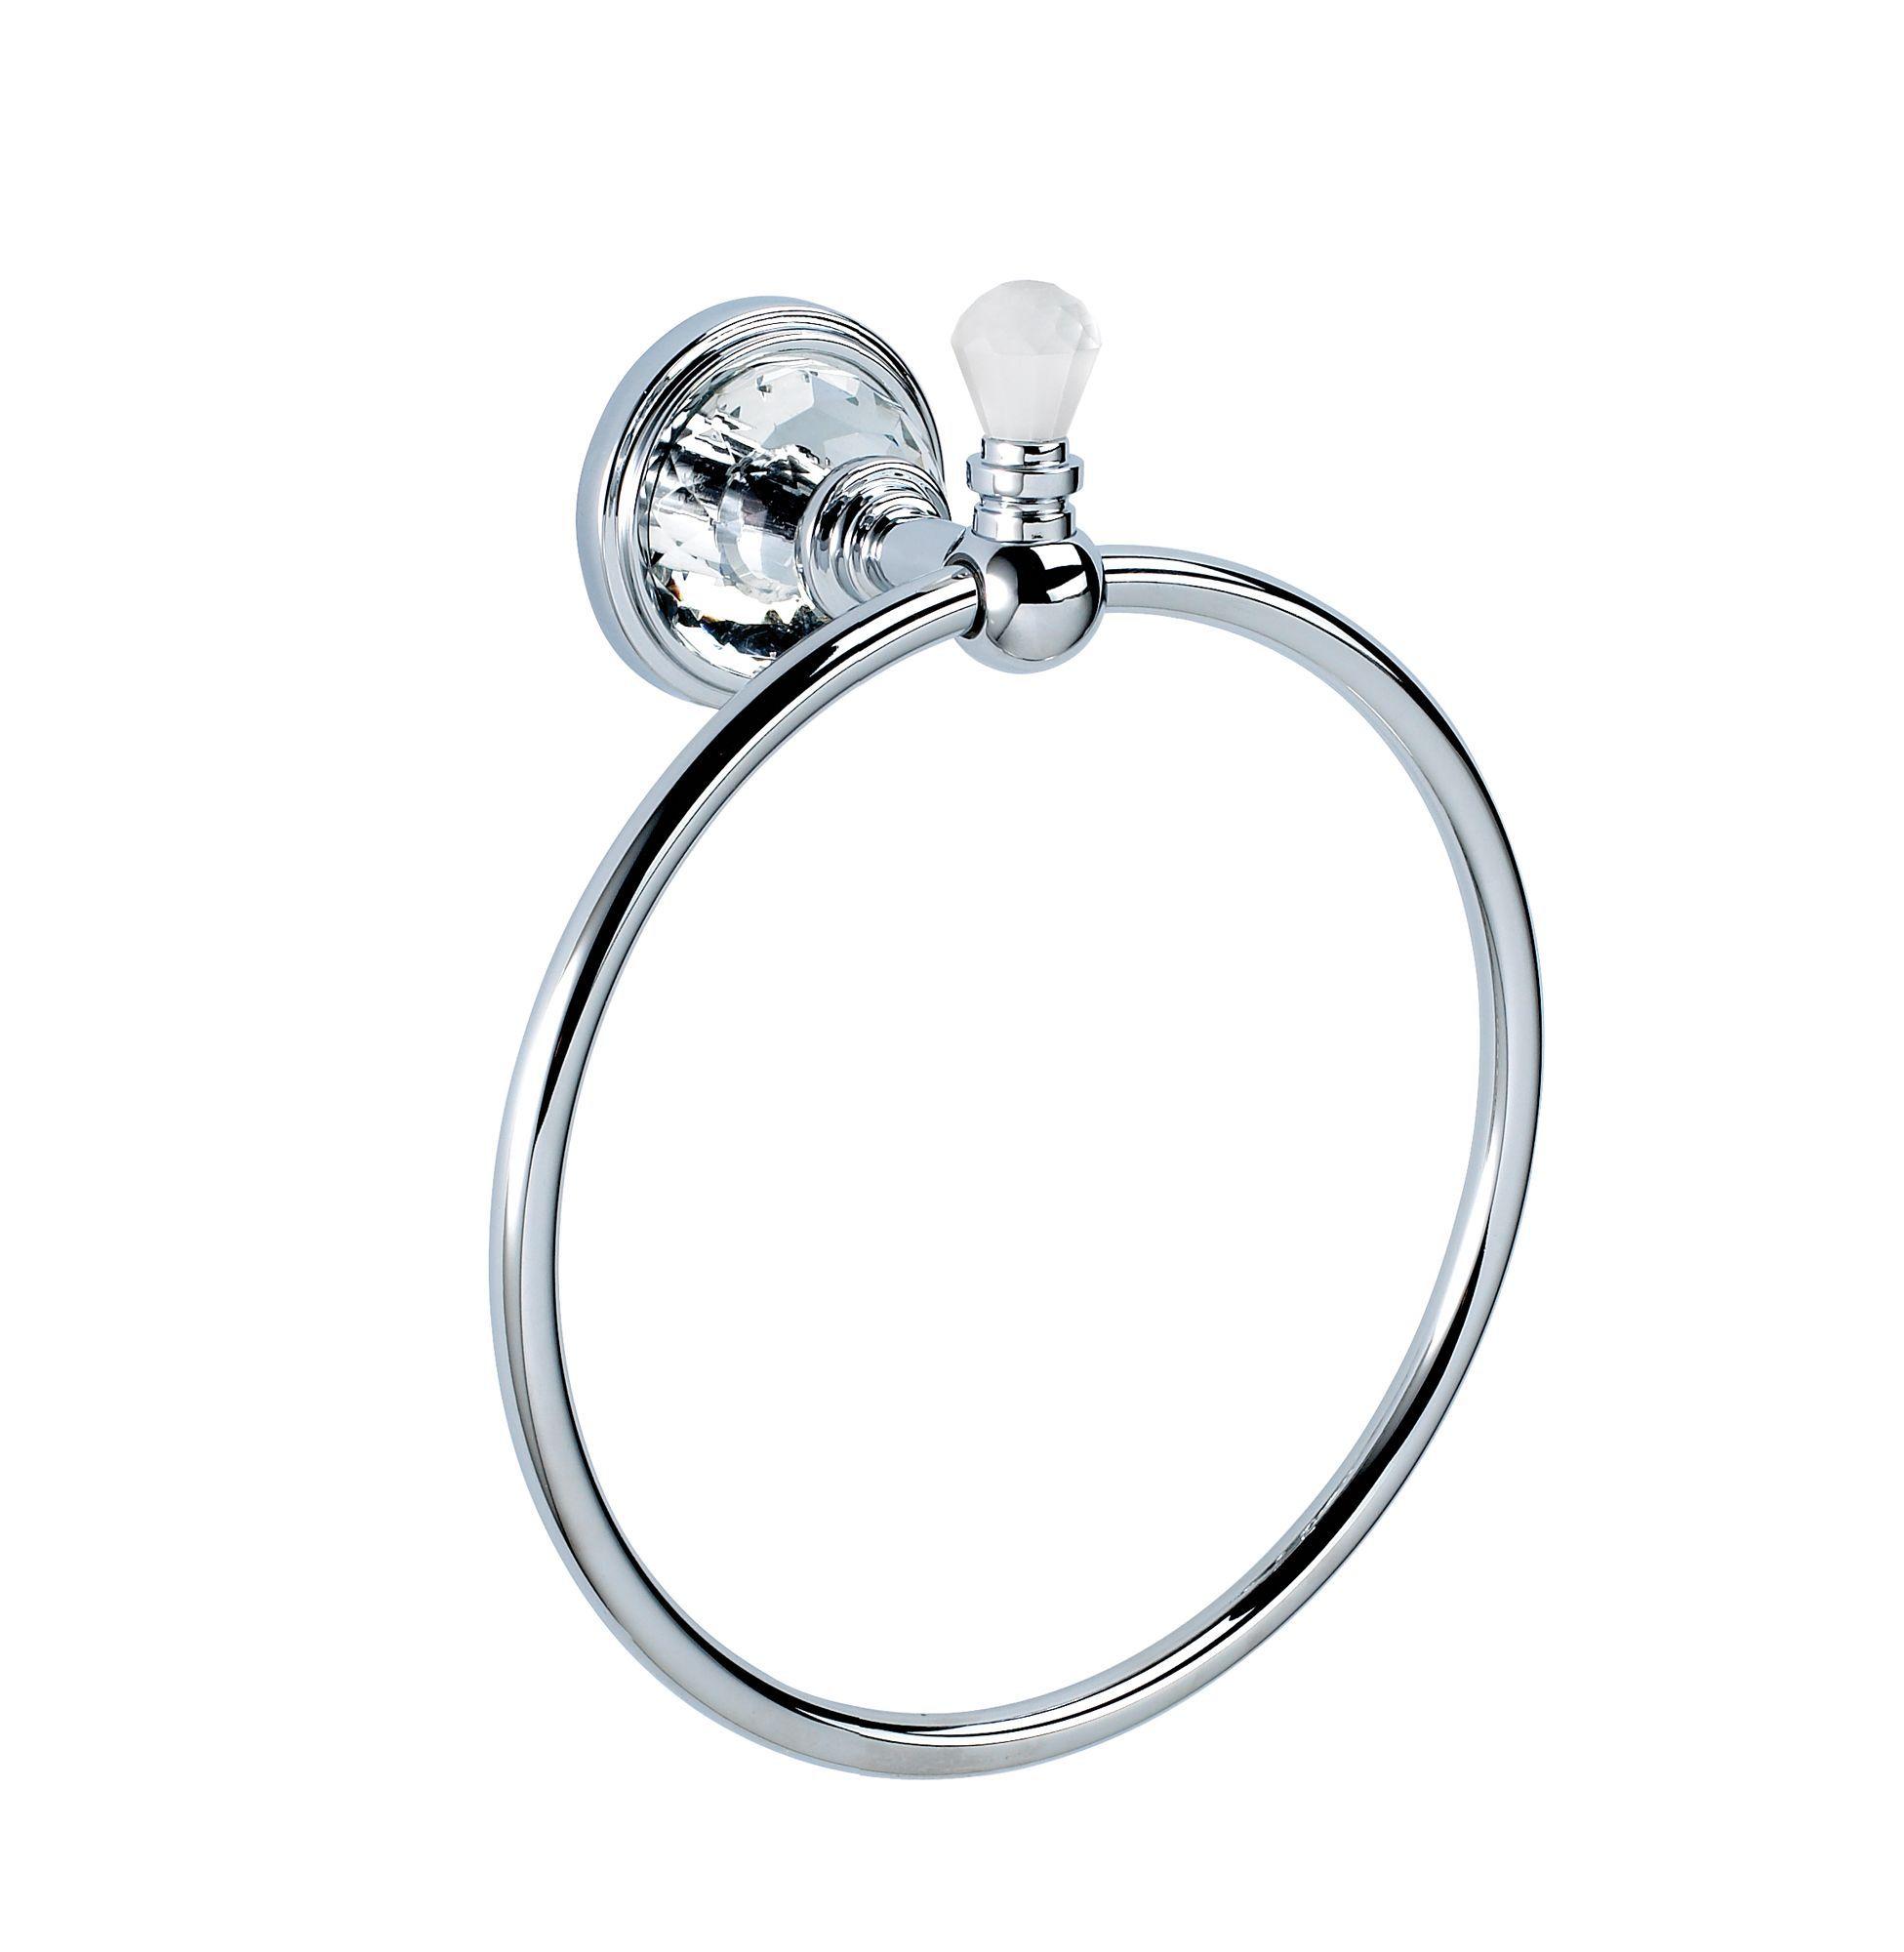 Bathroom Accessories At B Q - Cooke lewis eva chrome effect towel ring w 165mm departments diy at b q